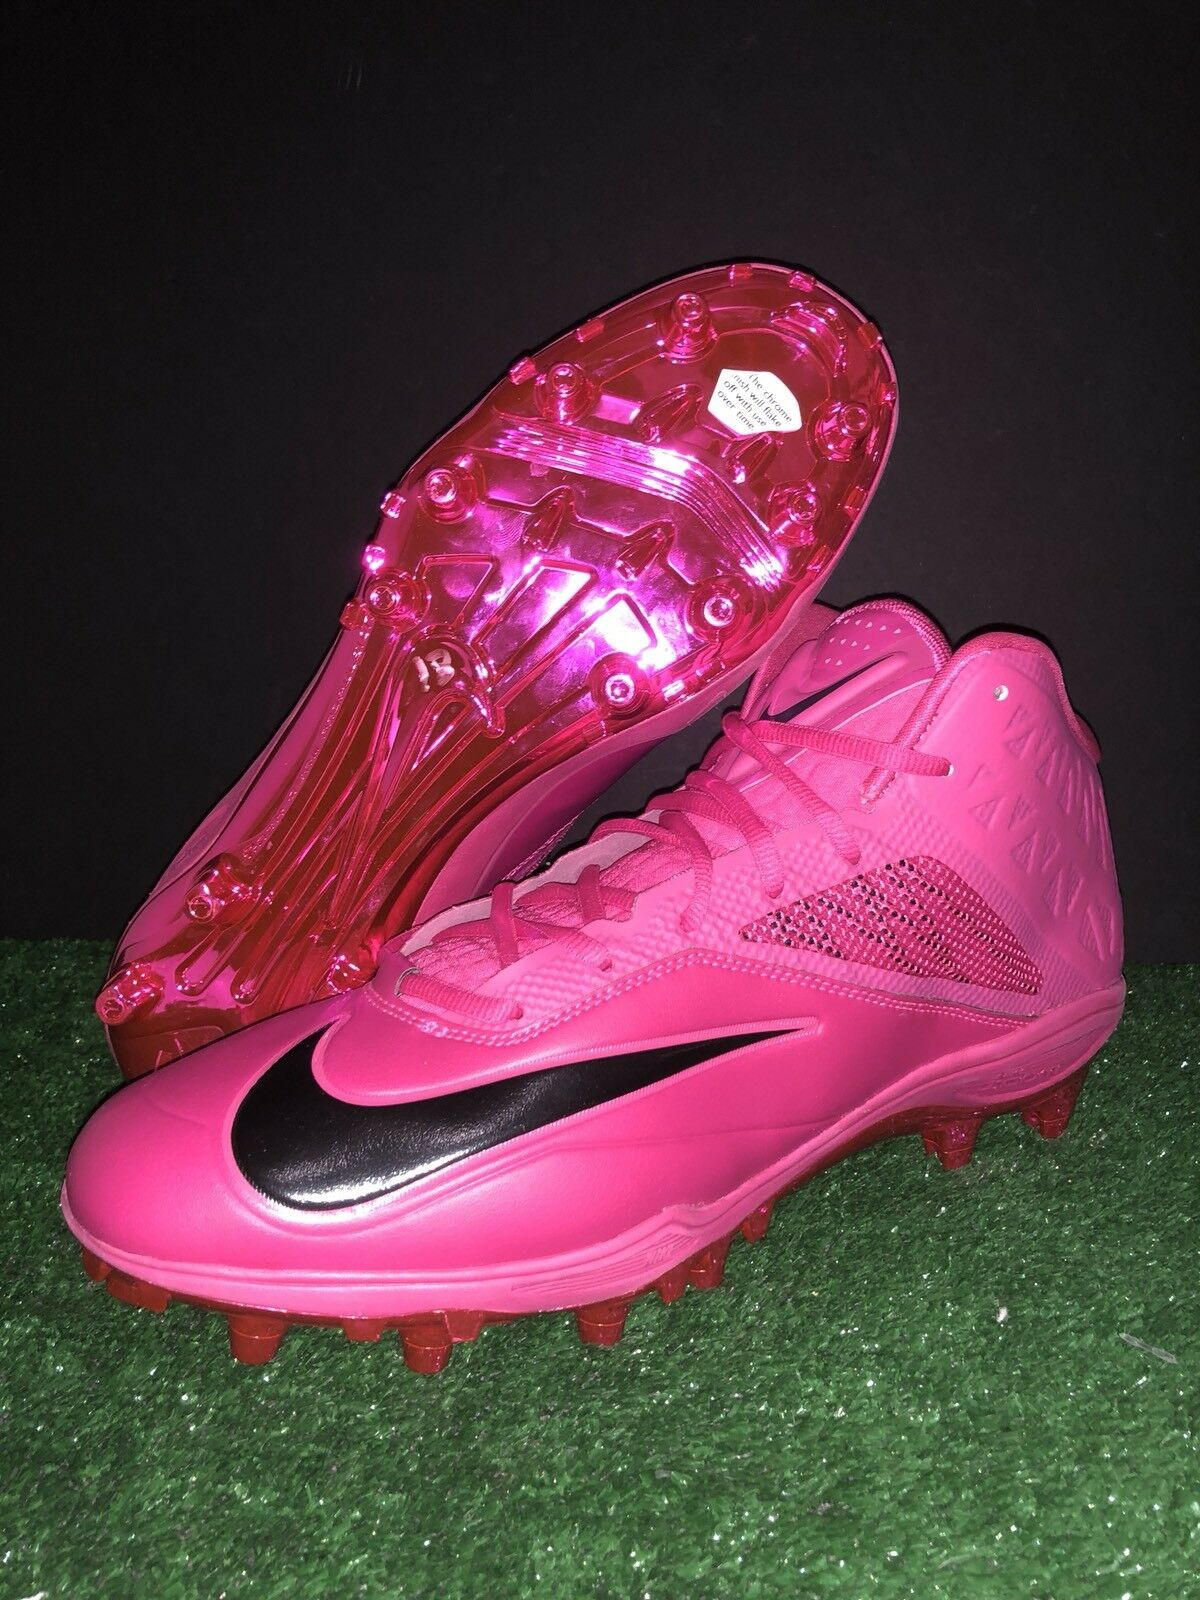 NIKE ZOOM CODE ELITE TD FOOTBALL CLEATS PINK 695508-606 MEN 14.5 BREAST CANCER